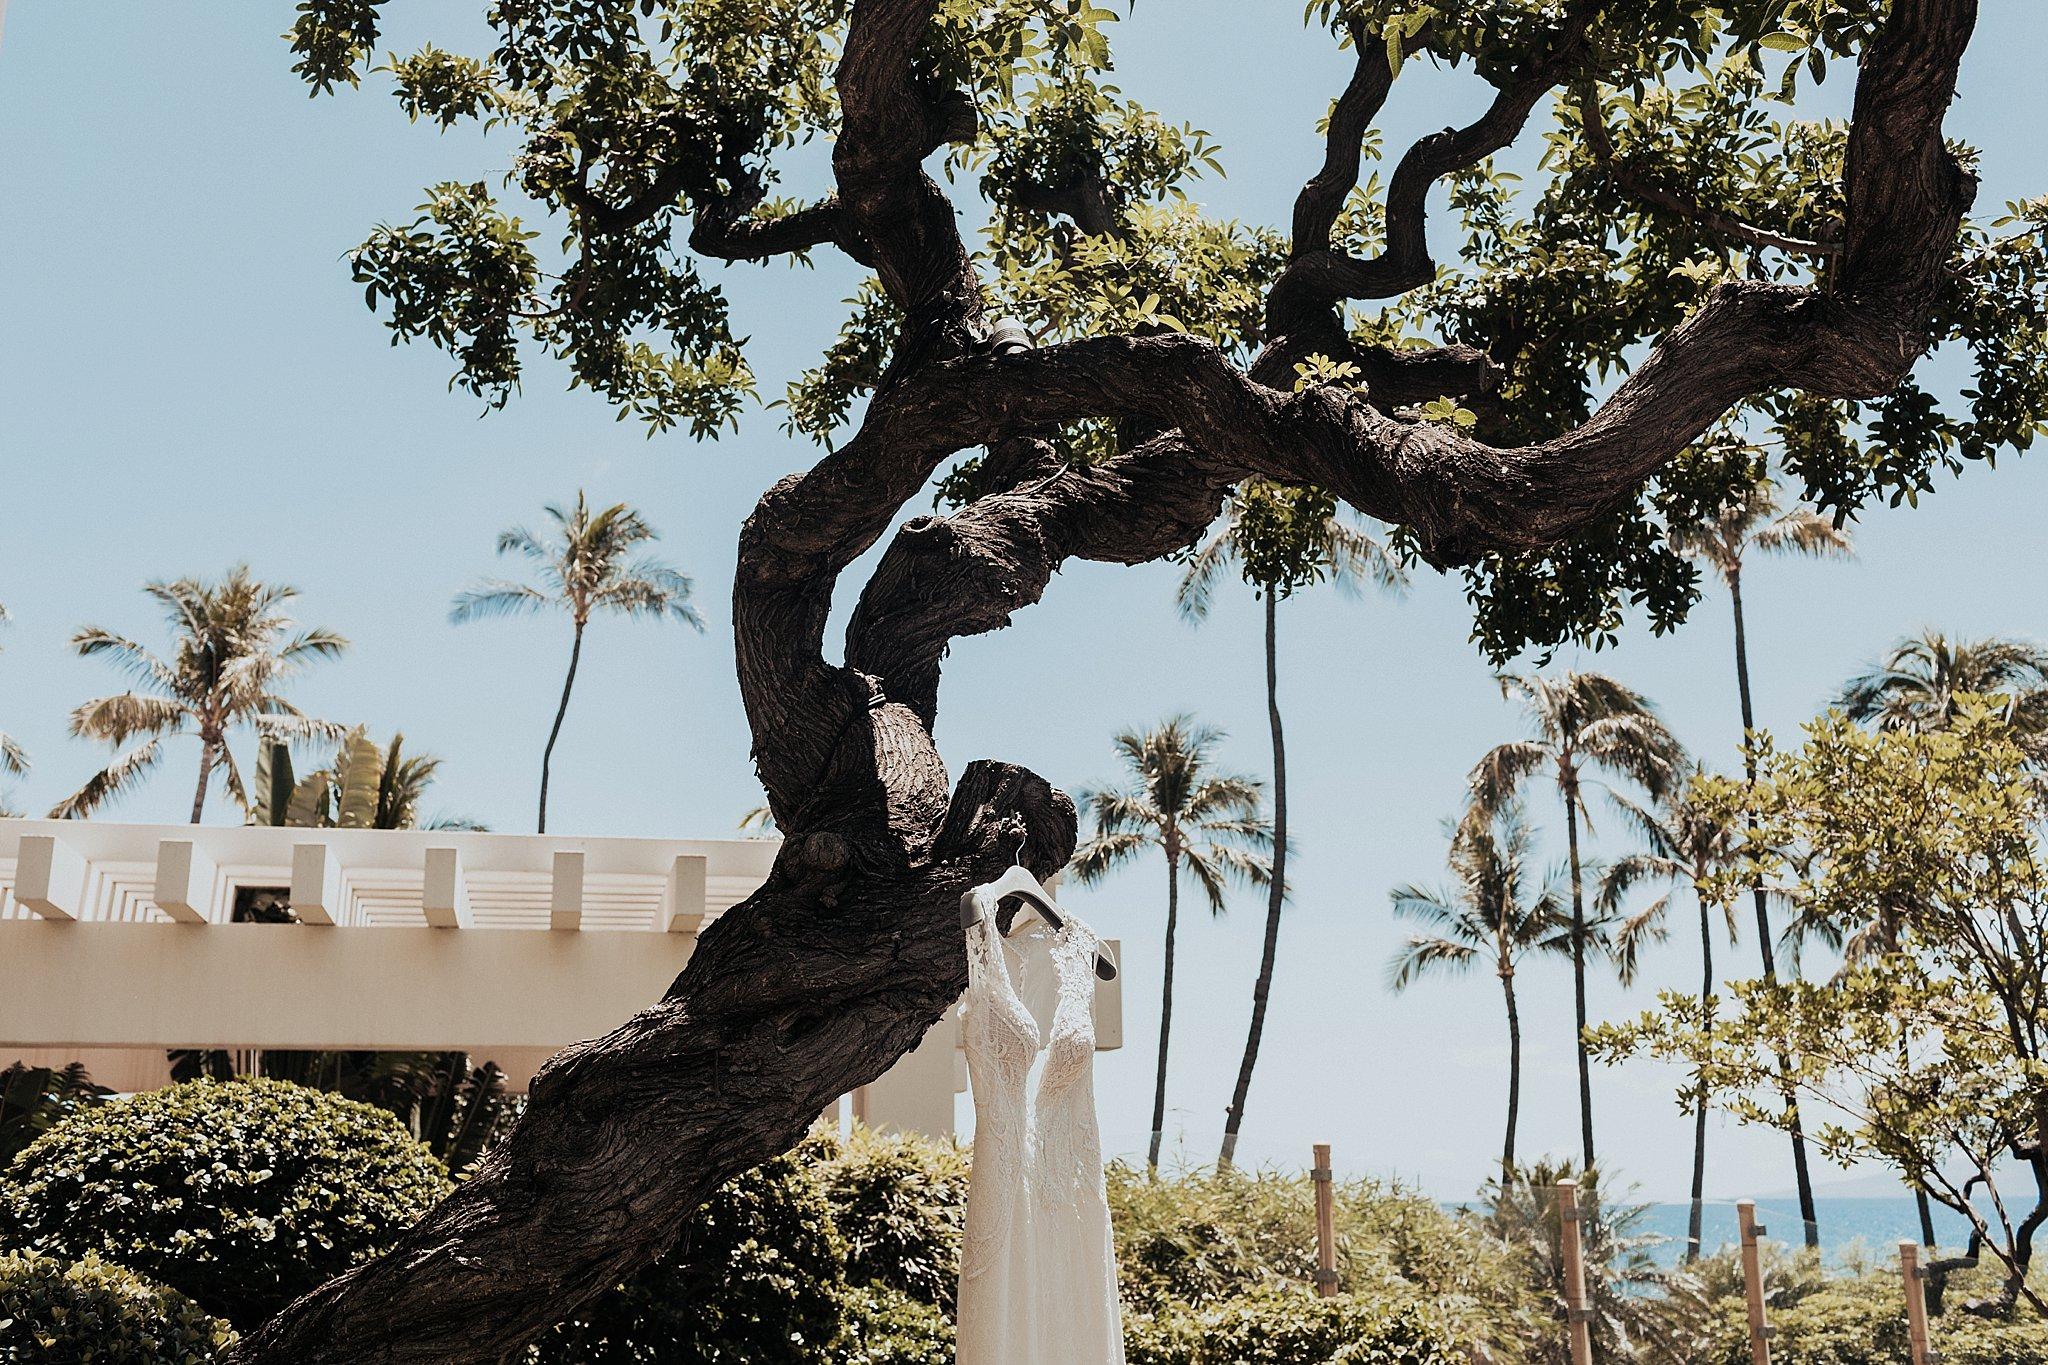 samantha_mcfarlen_bellingham_washington_engagement_photography_seattle_wedding_photographer_0150.jpg